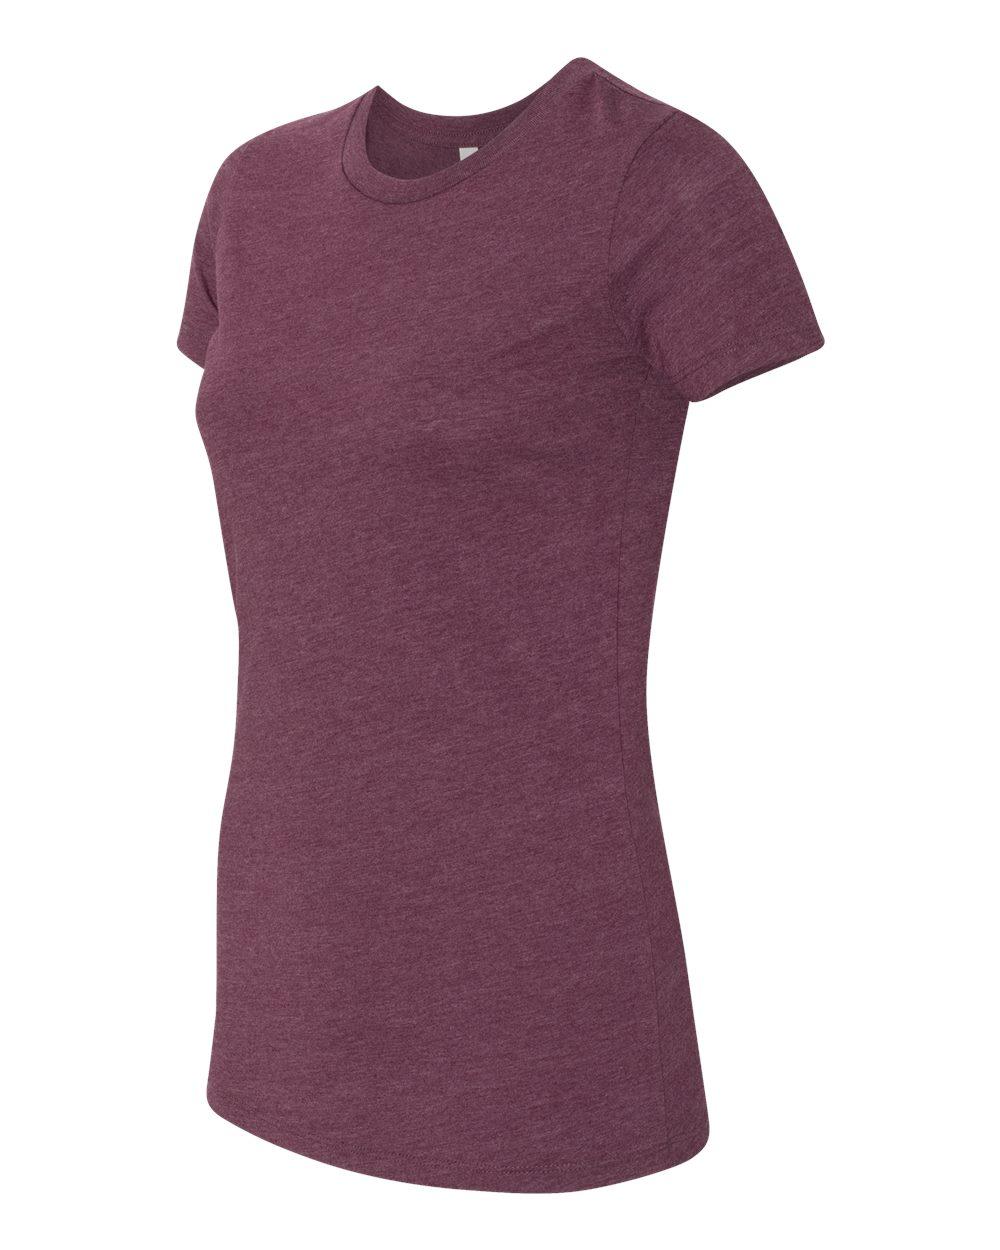 Bella-Canvas-Women-039-s-Favorite-T-Shirt-6004-S-2XL thumbnail 153